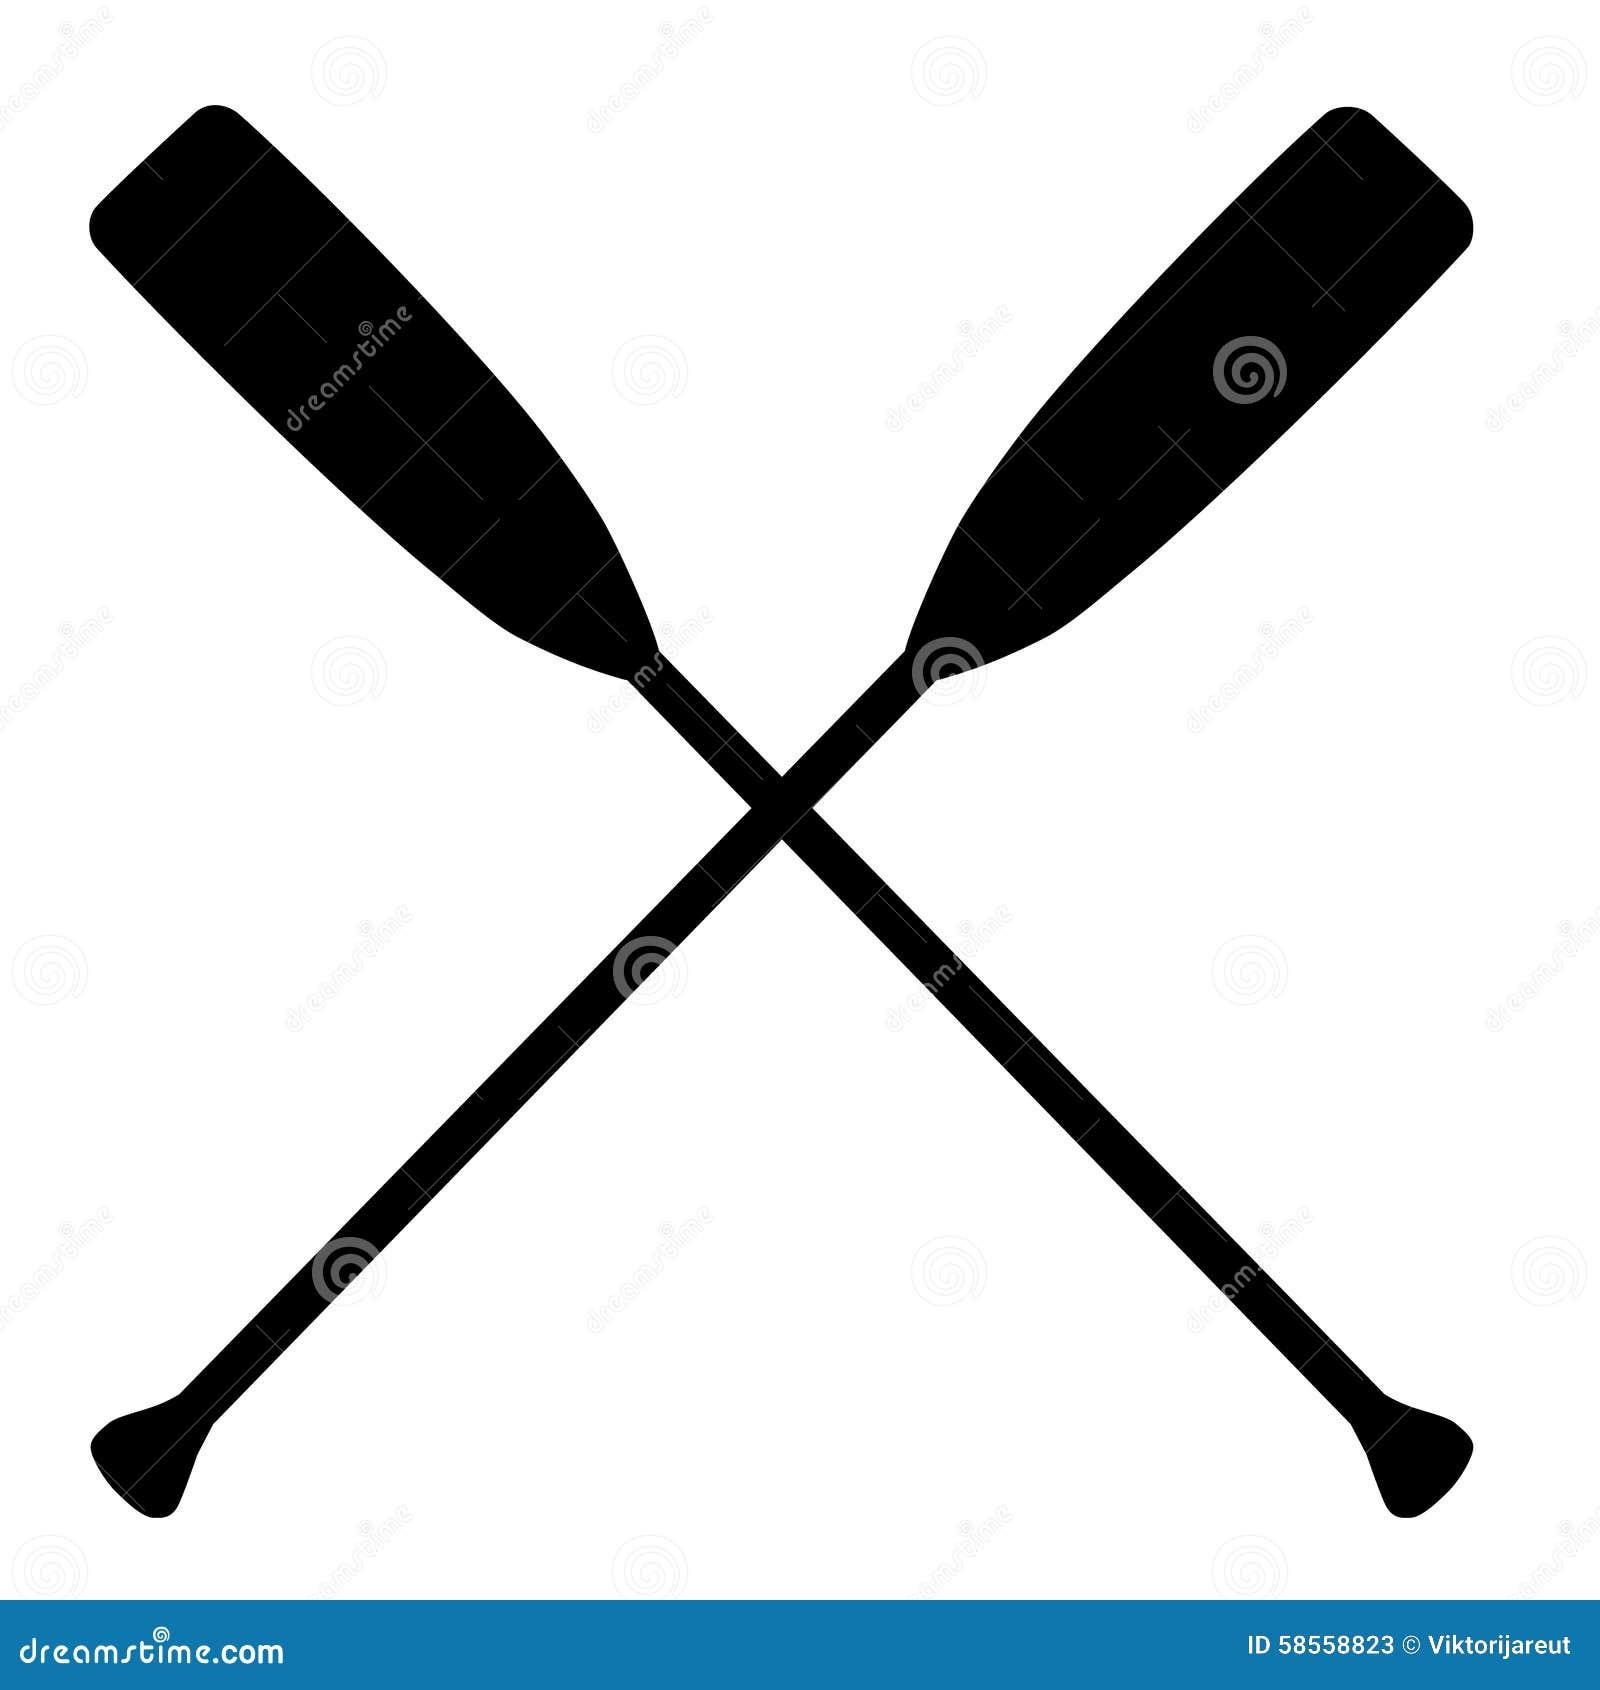 Crossed oars stock illustration. Illustration of cross ...